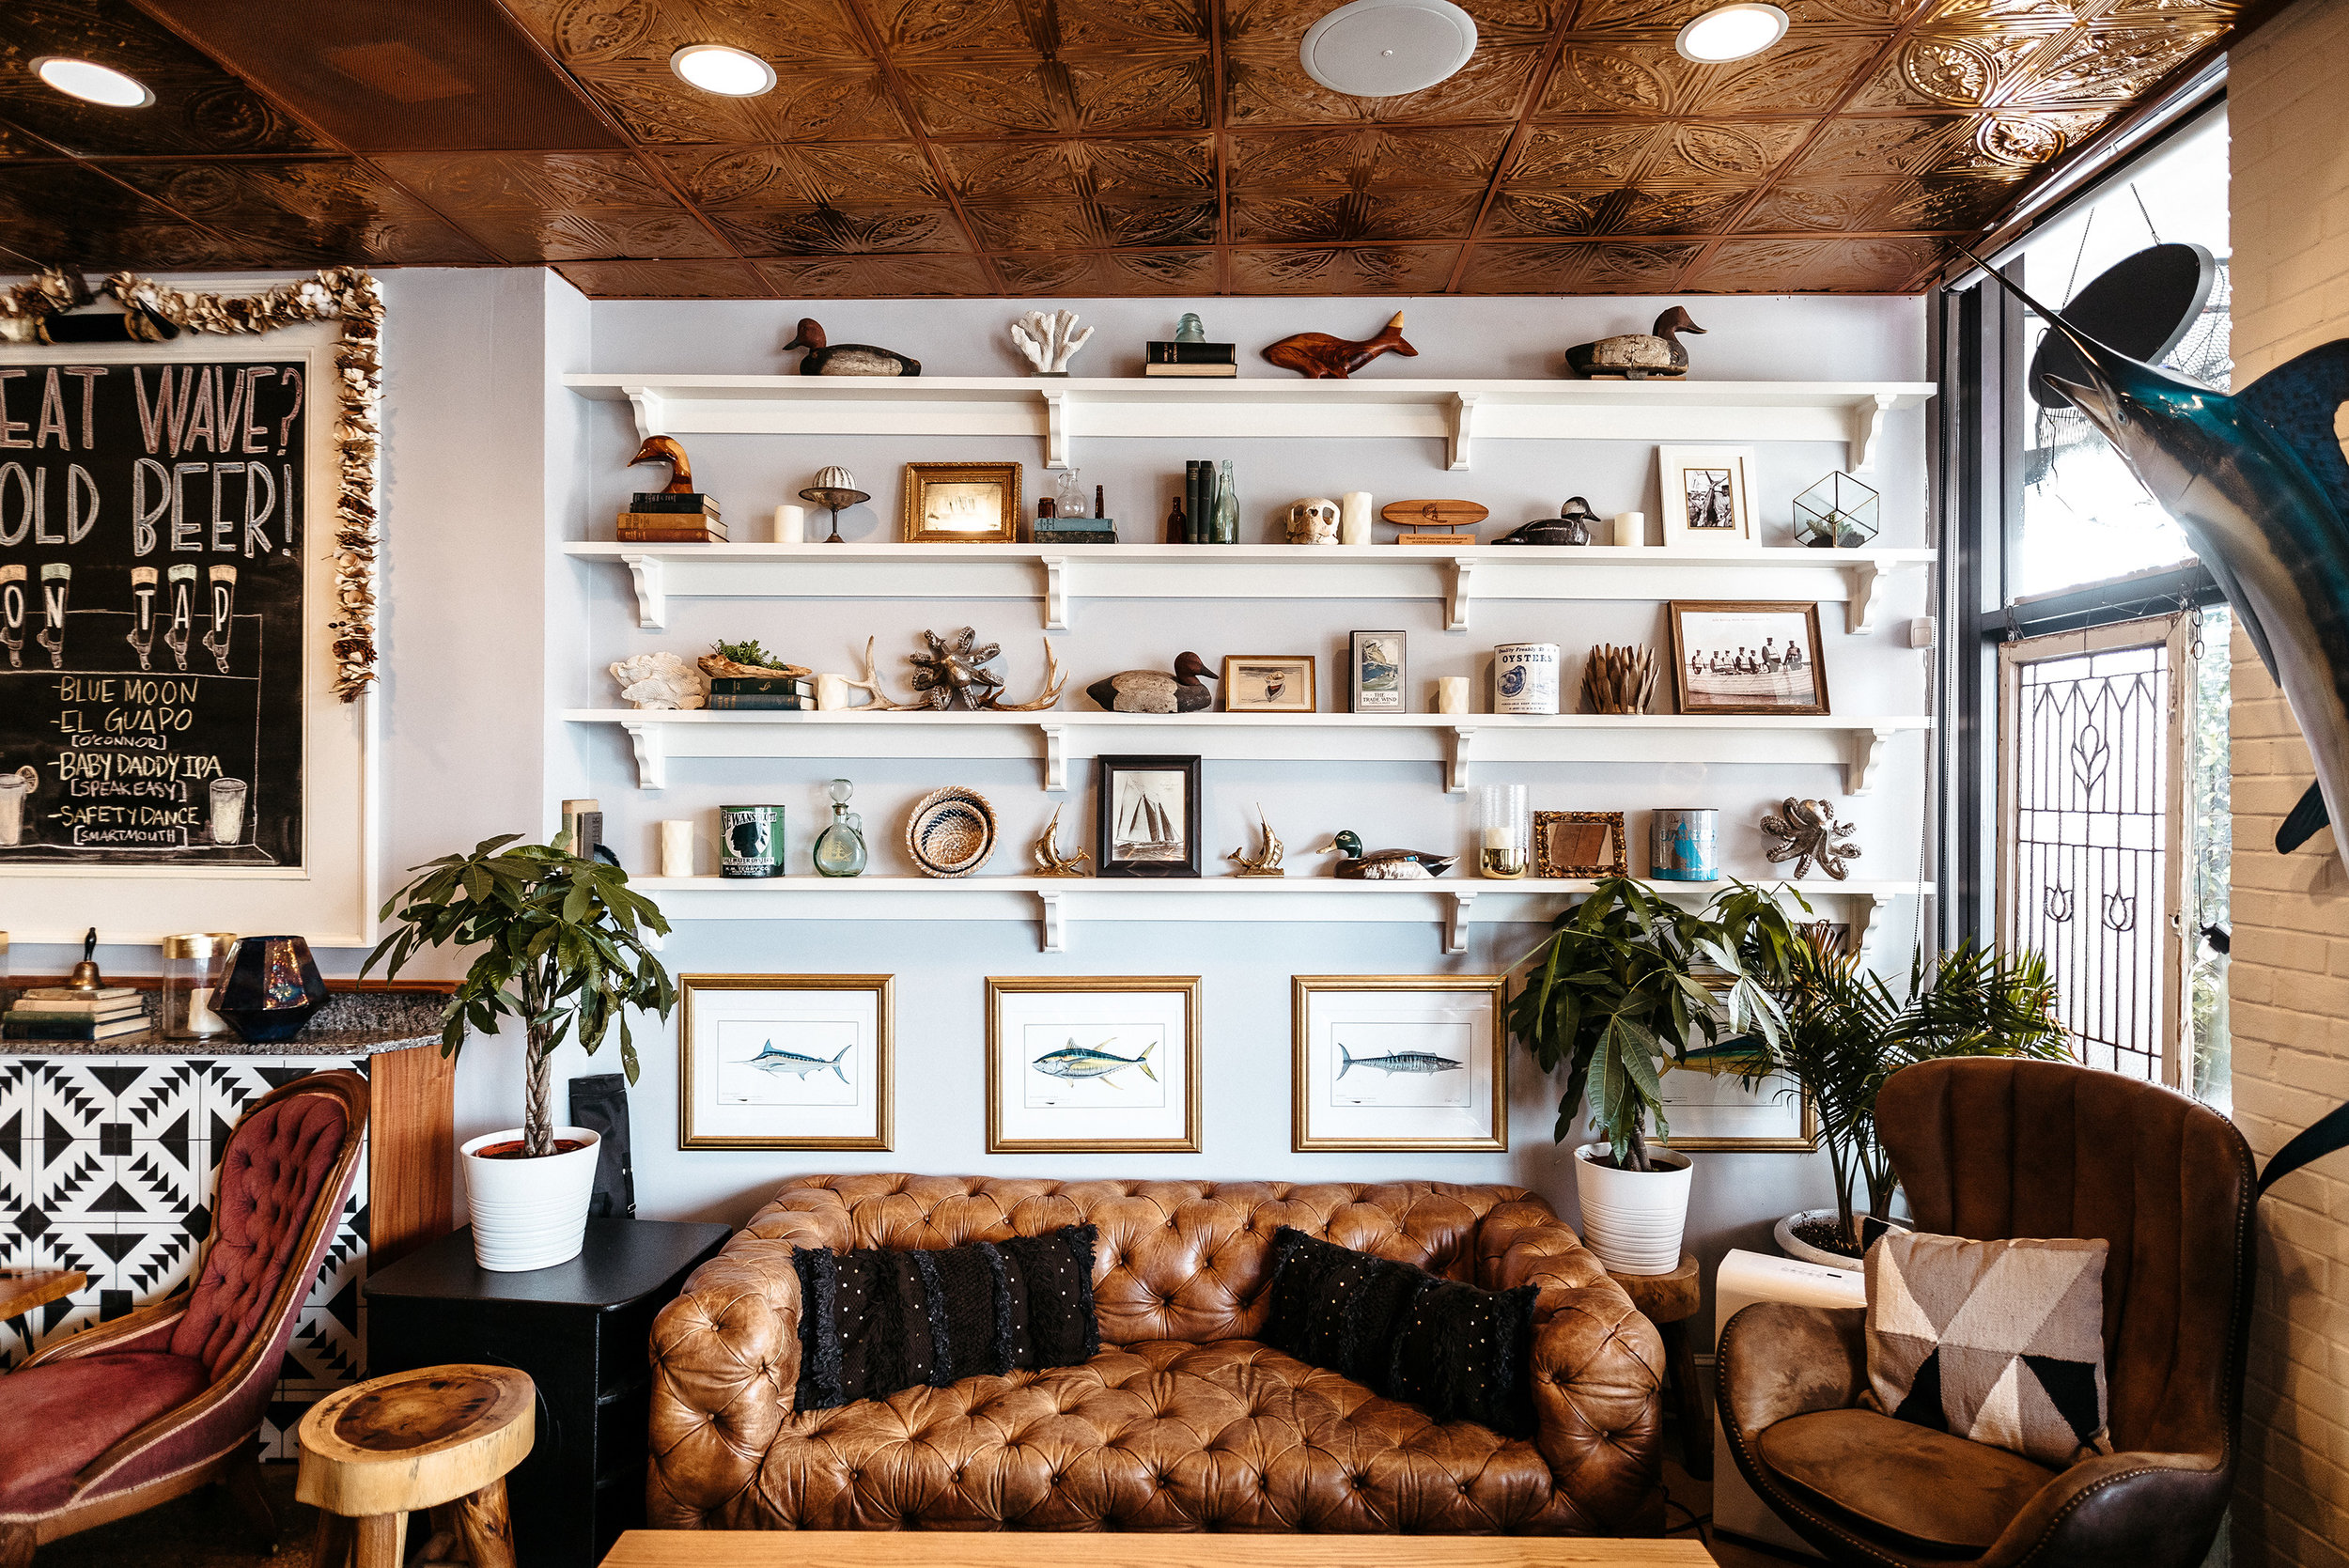 interior4-couch.jpg